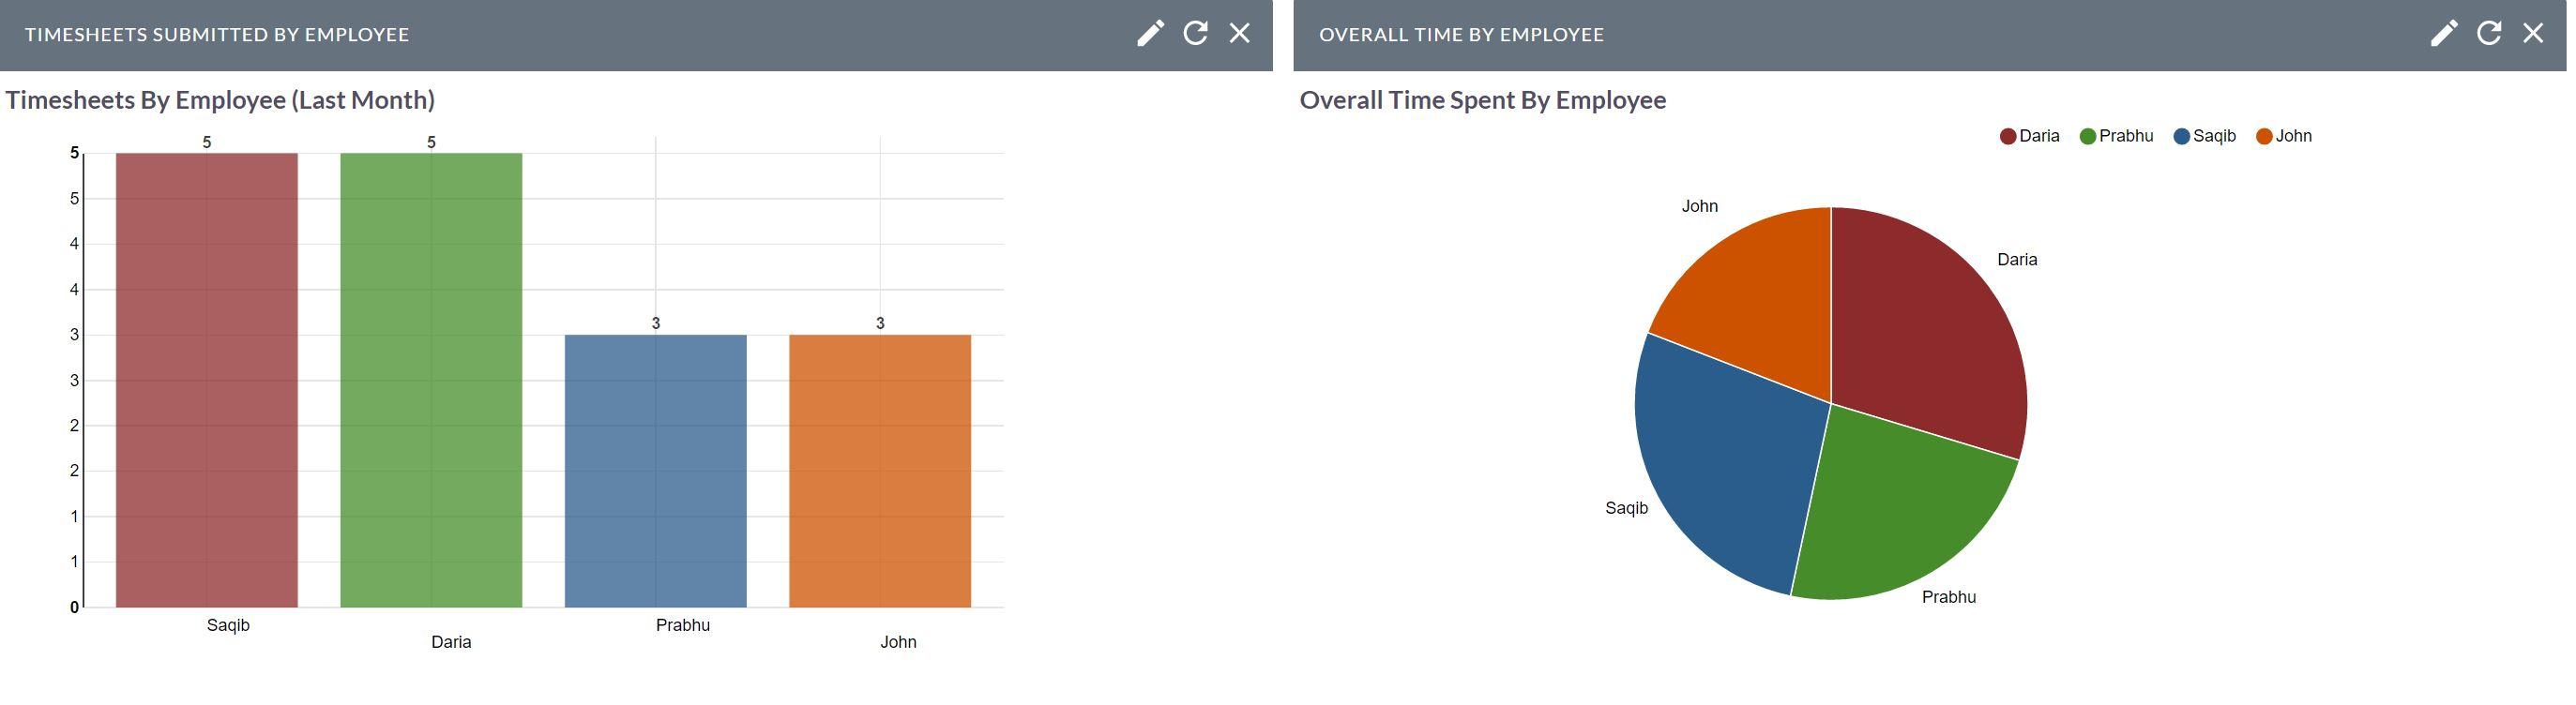 Employee Timesheet 2.JPG